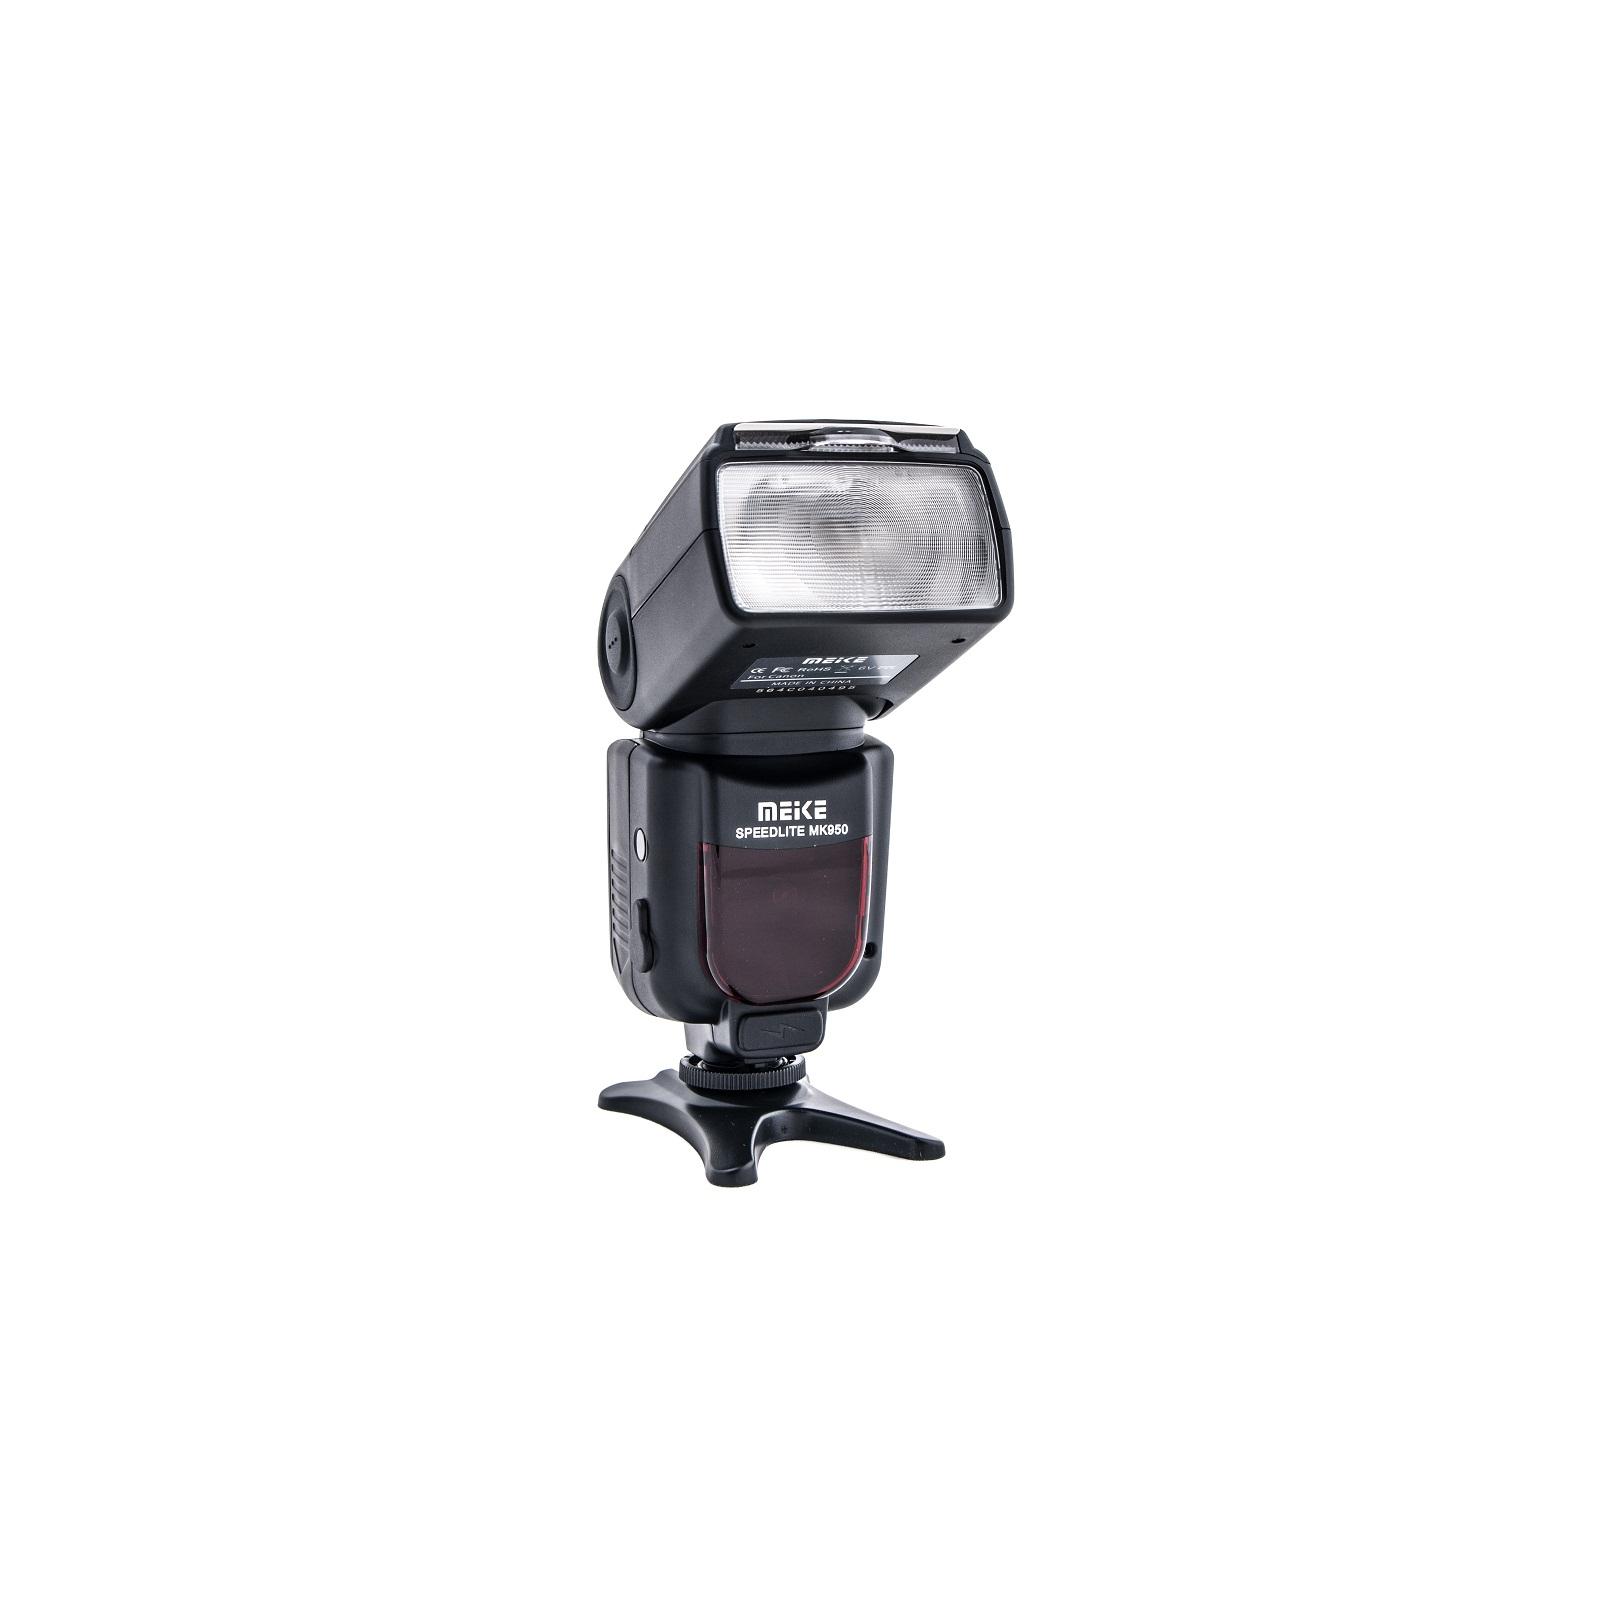 Вспышка Meike Nikon 950 (SKW950N)